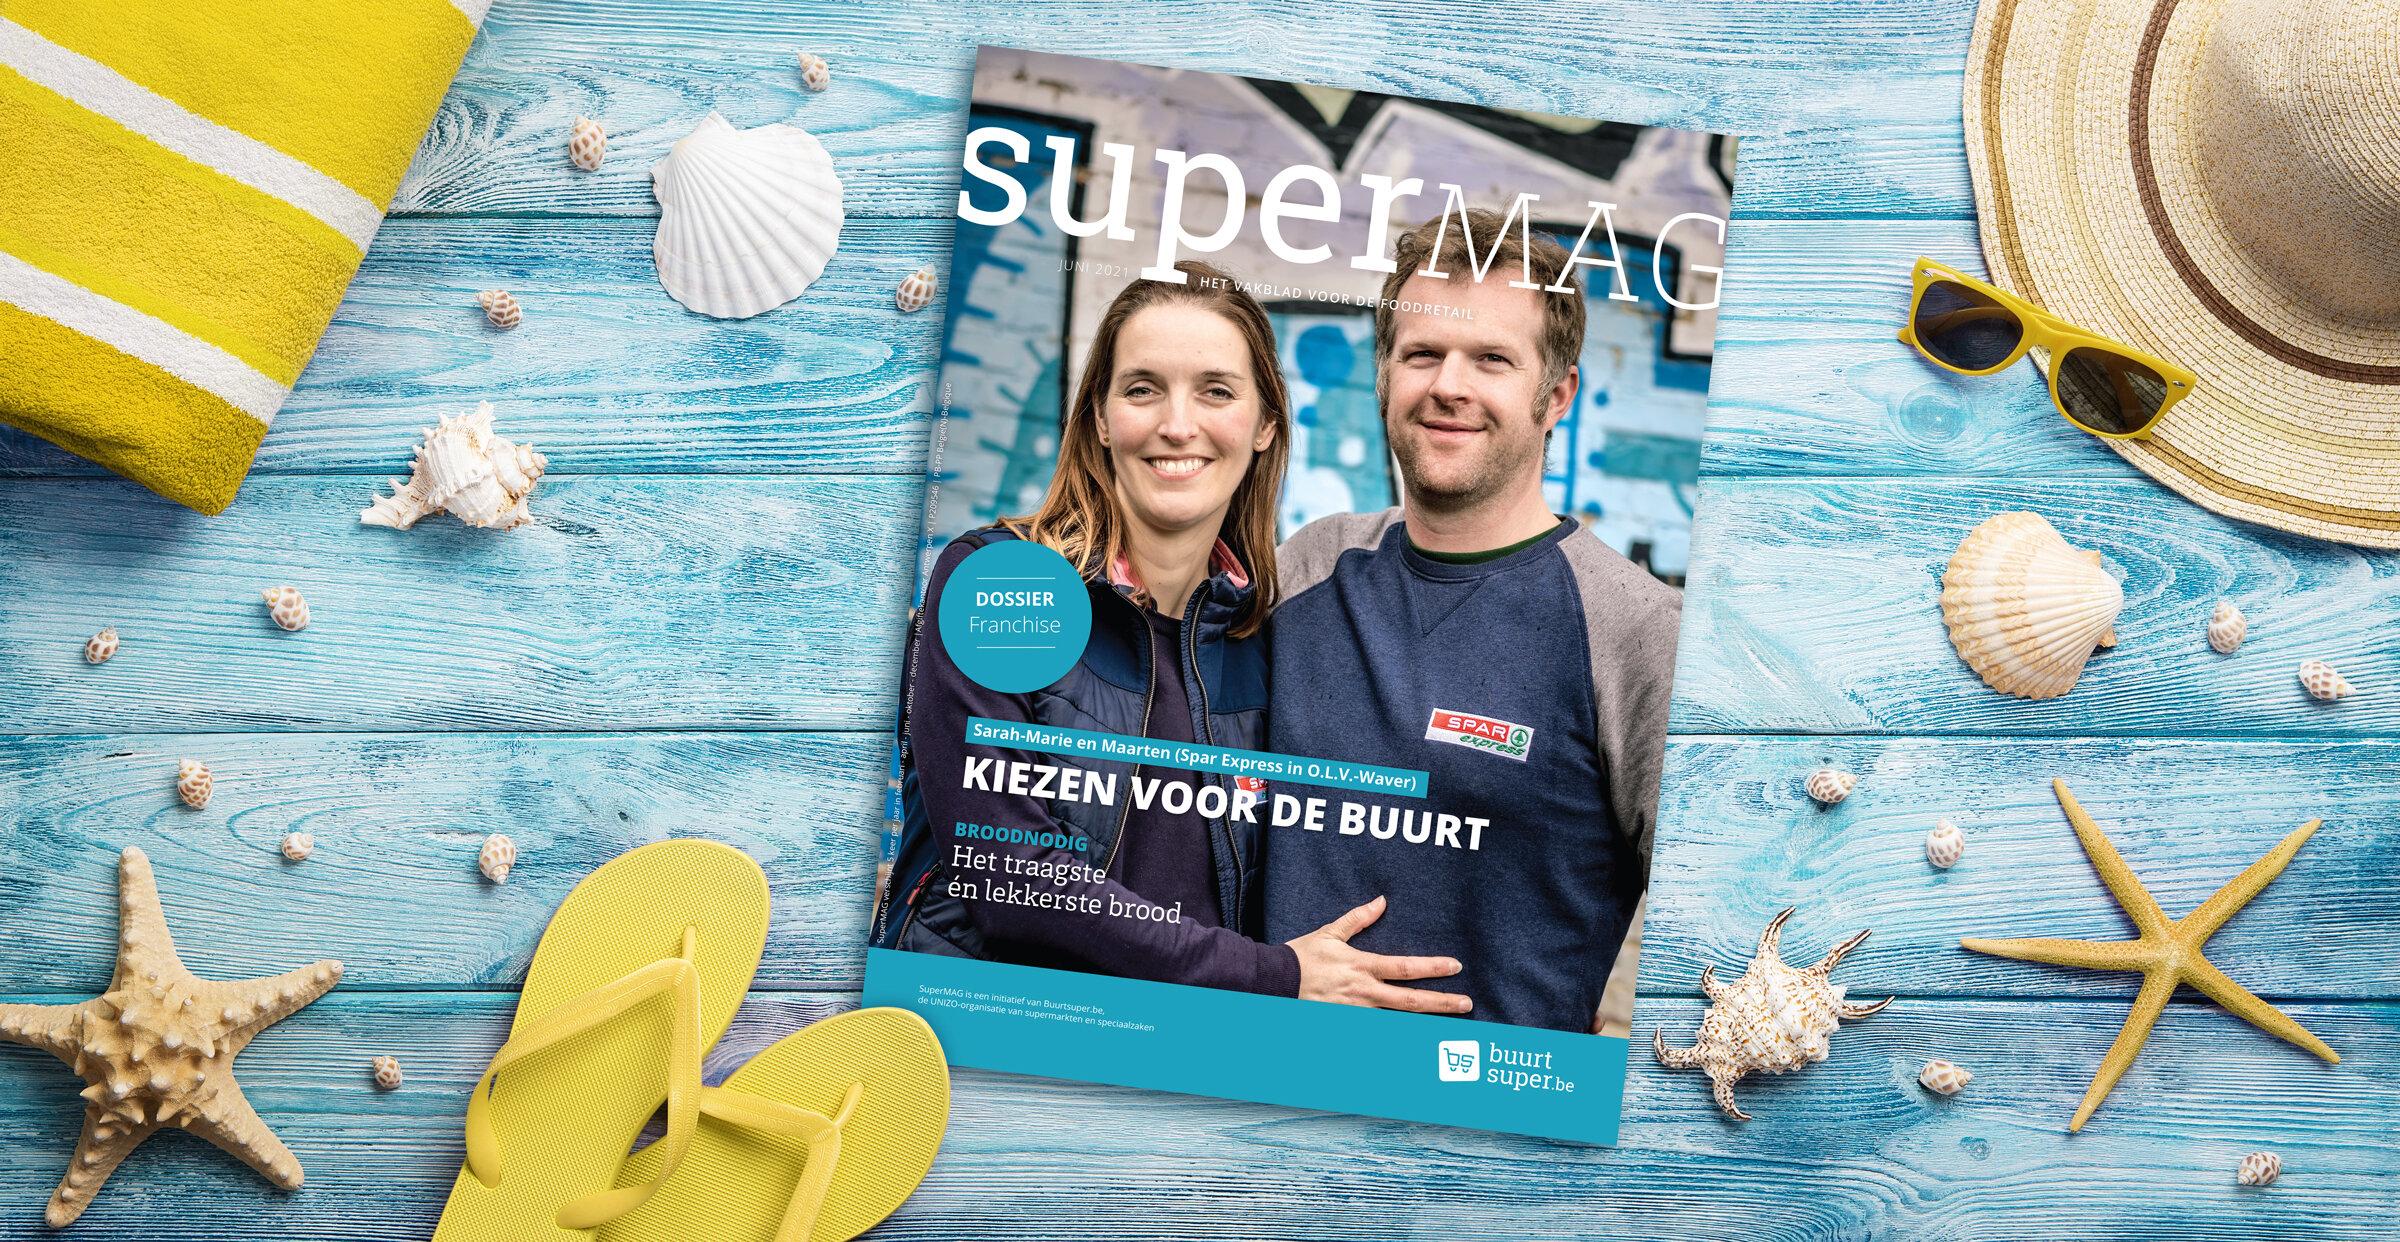 https://issuu.com/buurtsuper.be/docs/buurtsuper-supermag-juni-2021-lr-pages_issuu?fr=sNzk4ZTM3OTc3NDc